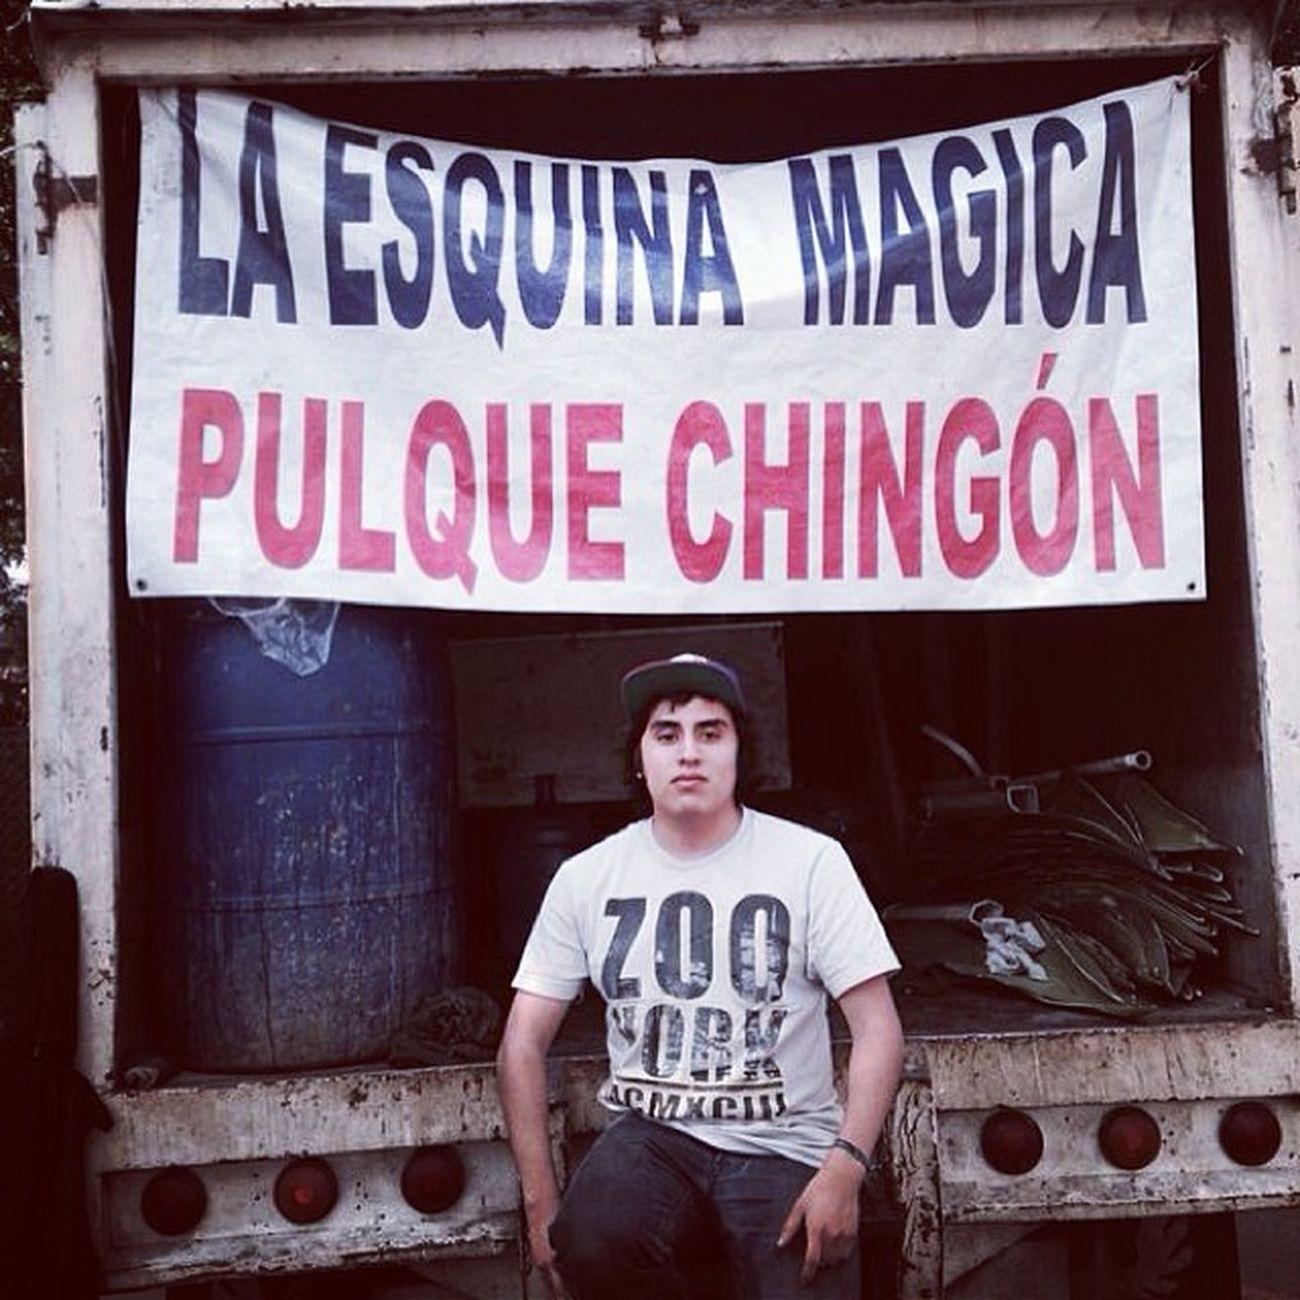 Laesquinamagica PULQUE Pulques Mexico drink maguey chingon rayado skateboard zooyork ny empezandobieneldia